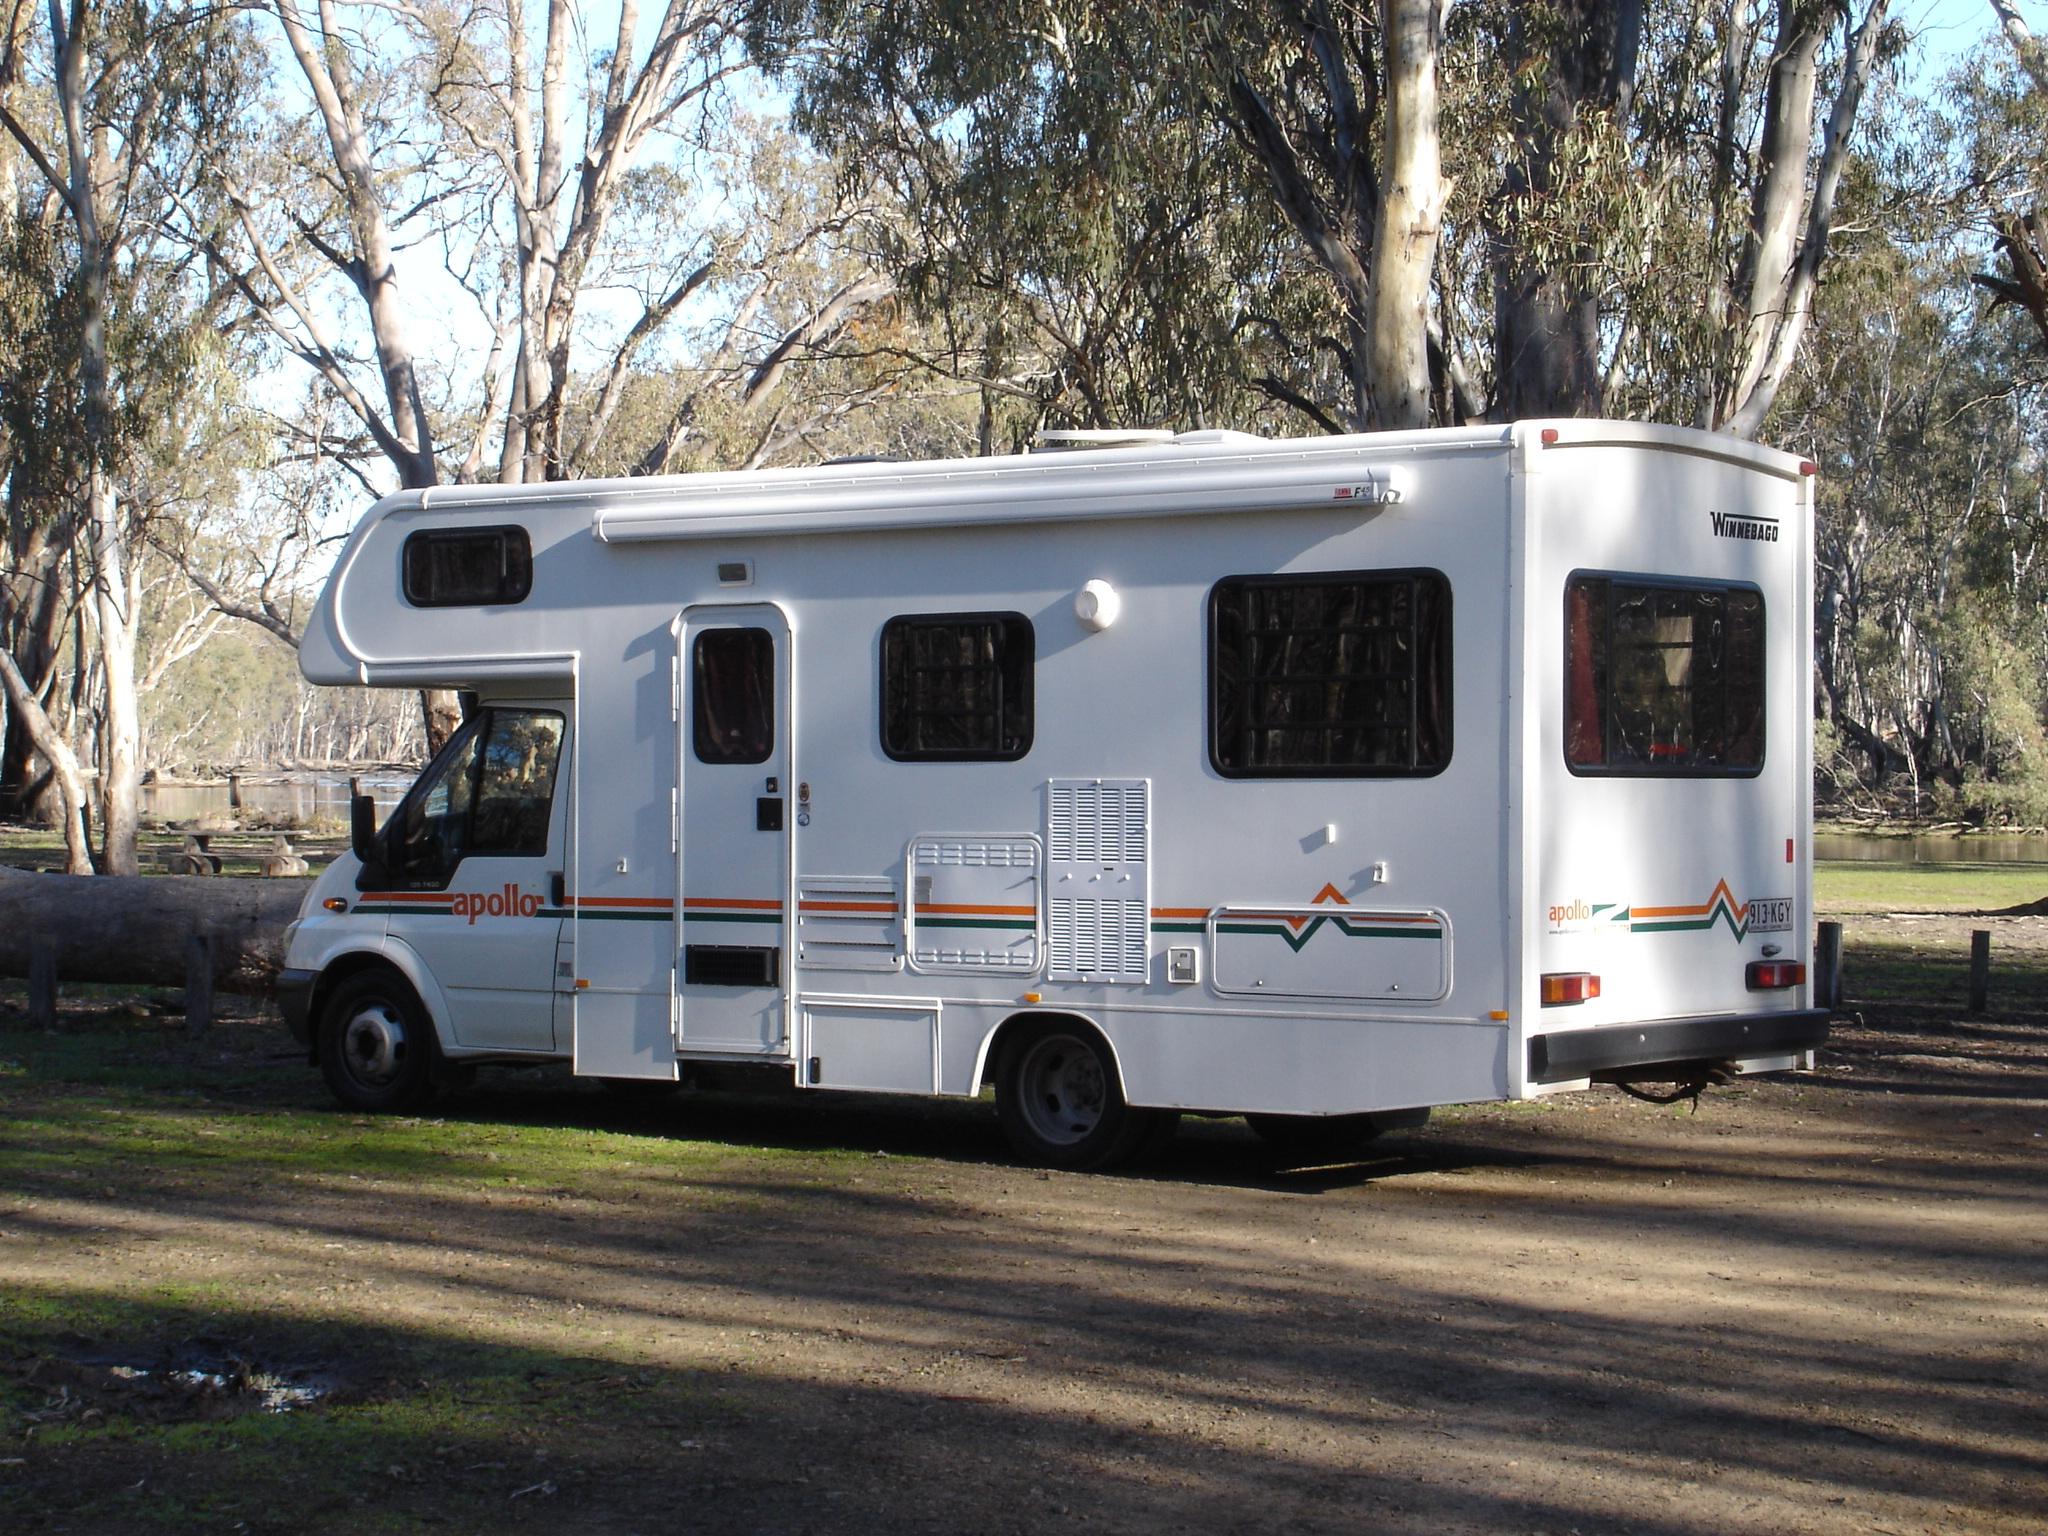 acheter un camping-car d'occasion